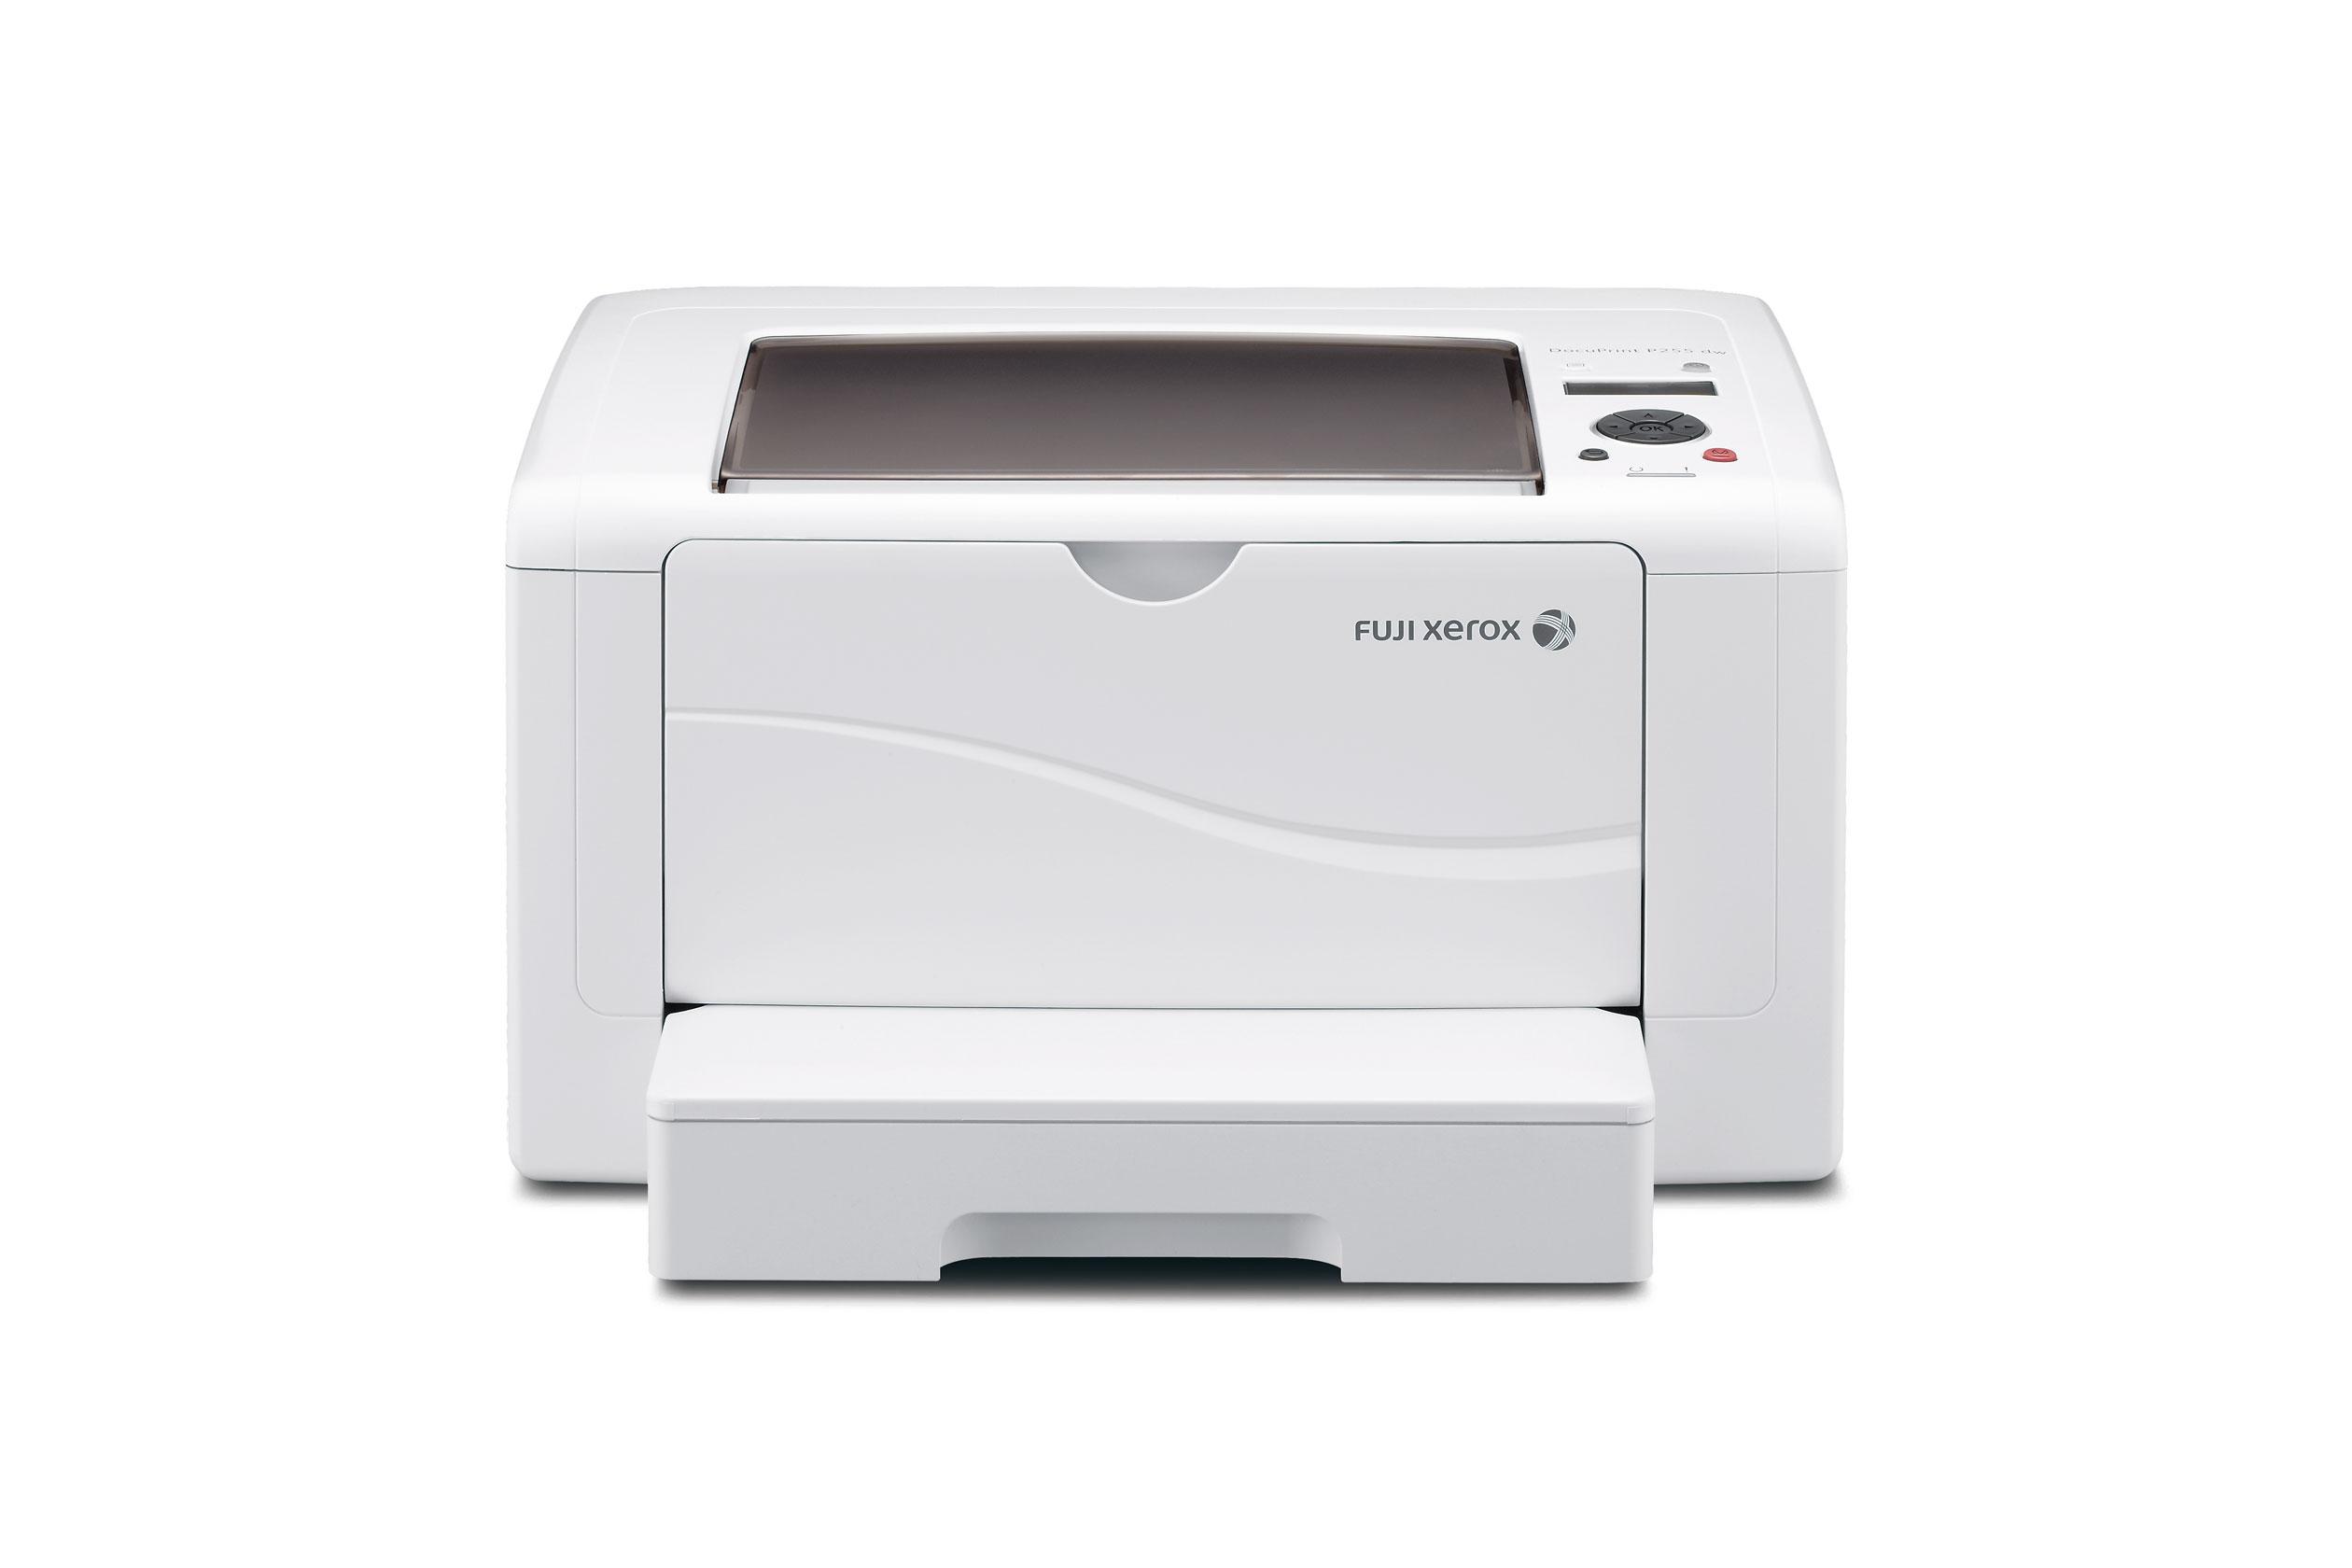 Fuji Xerox DocuPrint P255dw Mono Laser Printer